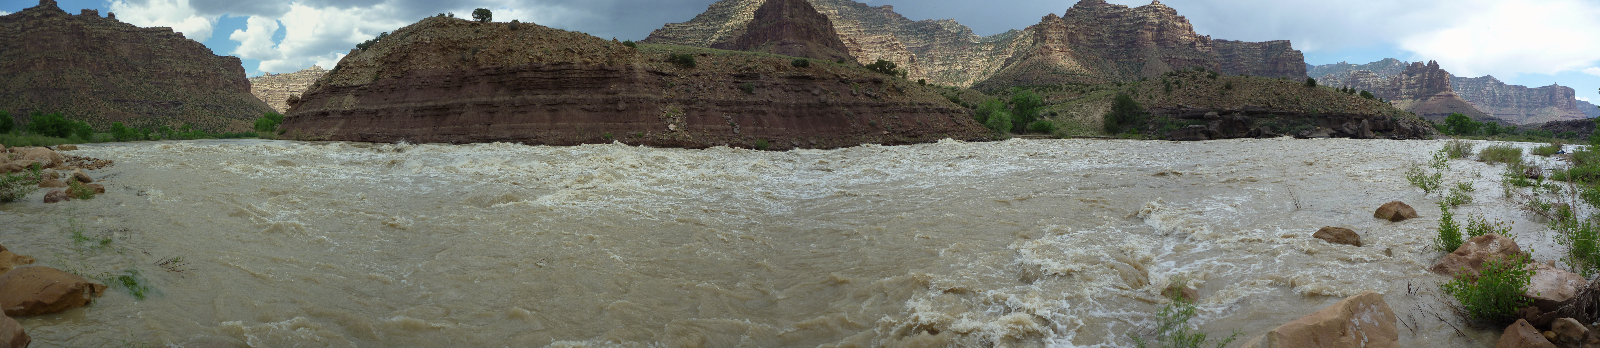 Click image for larger version  Name:Joe Hutch Canyon Panorama.JPG Views:193 Size:914.8 KB ID:1547